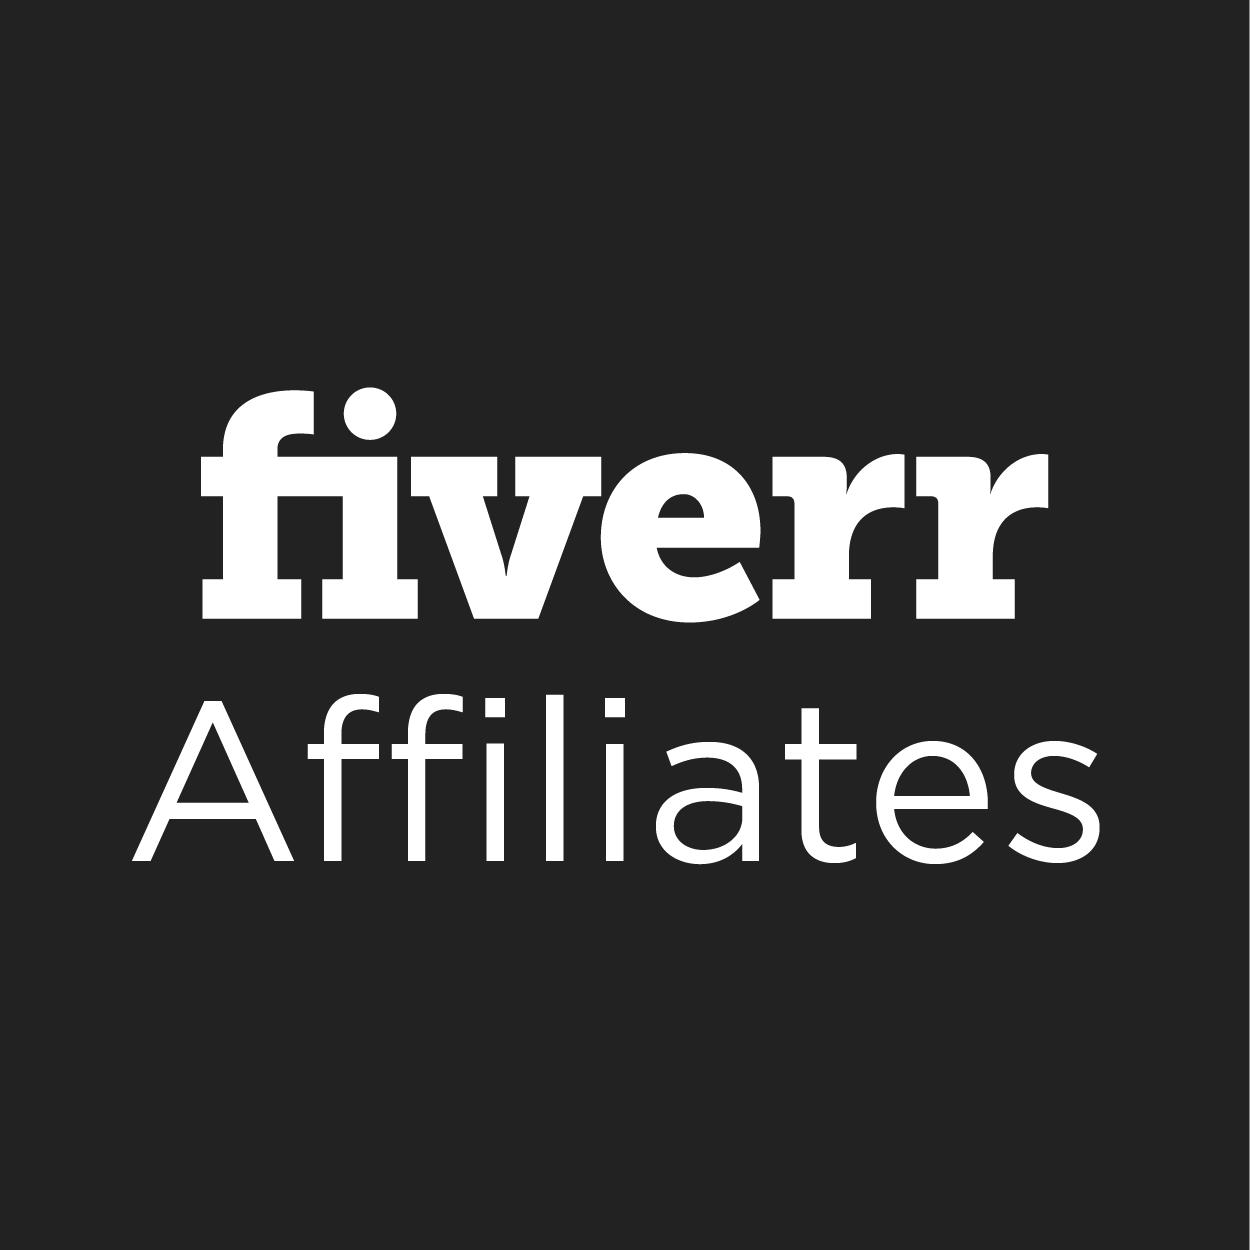 Fiverr Affiliates reviews, beoordelingen en ervaringen